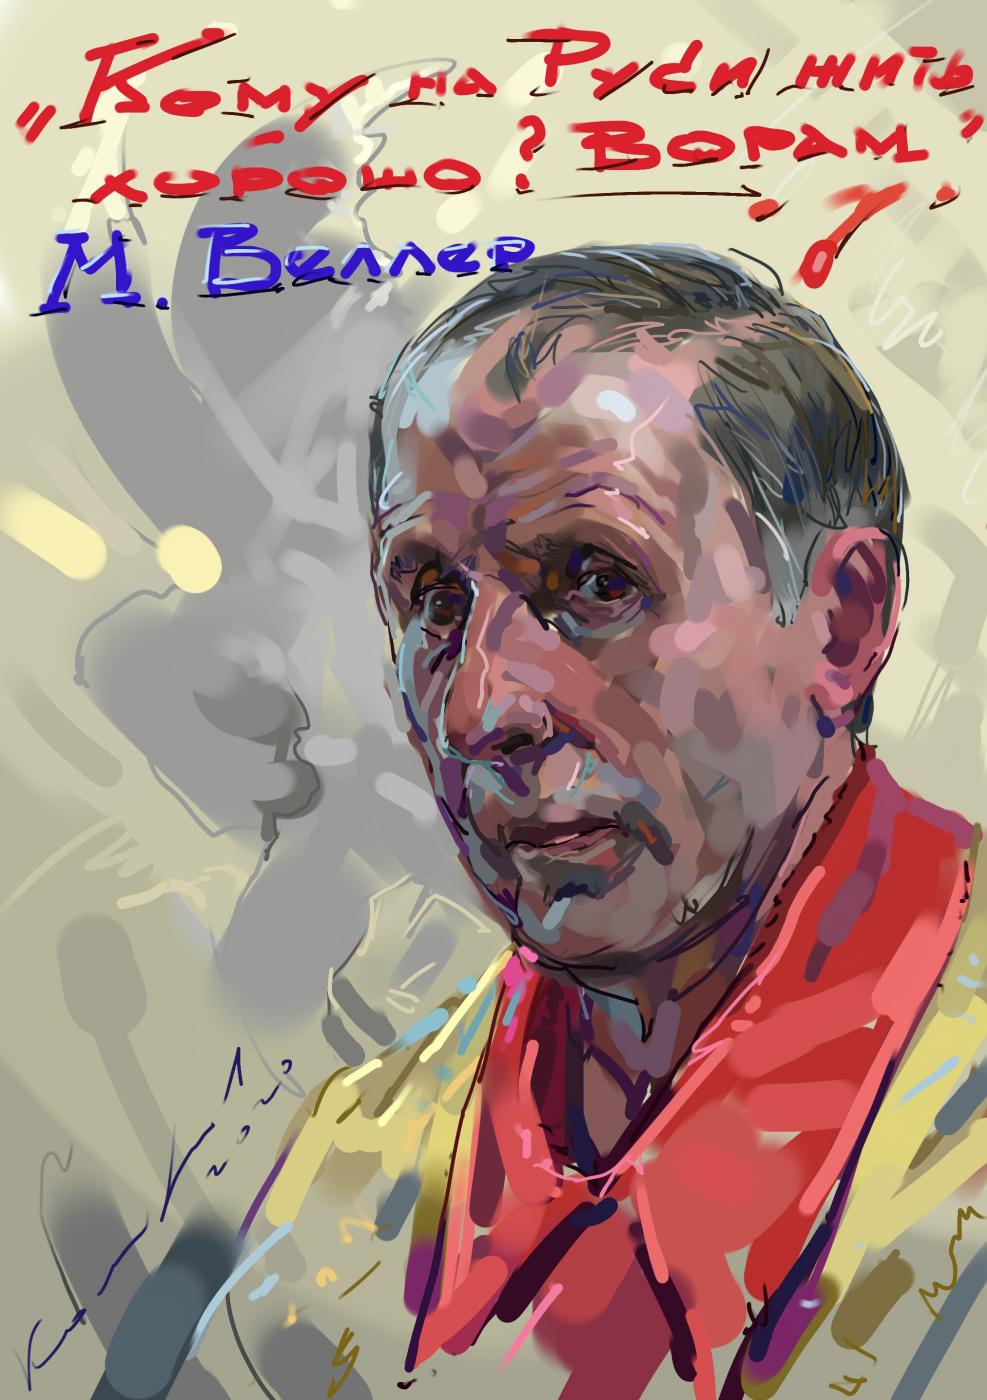 Igor Vladimirovich Komarov. To